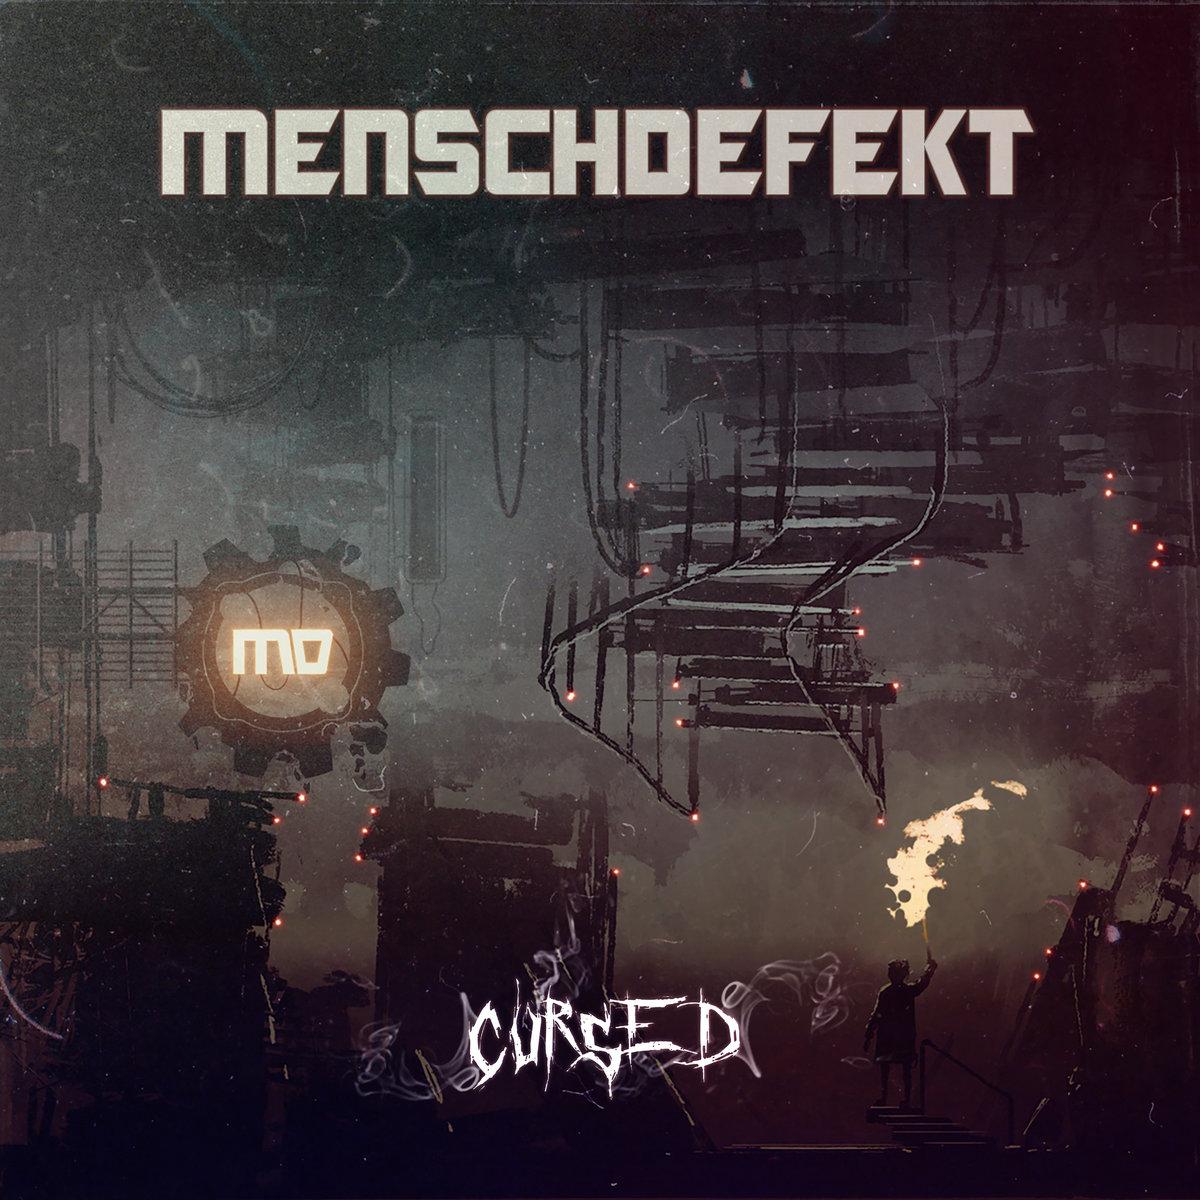 Menschdefekt - Cursed - Menschdefekt - Cursed